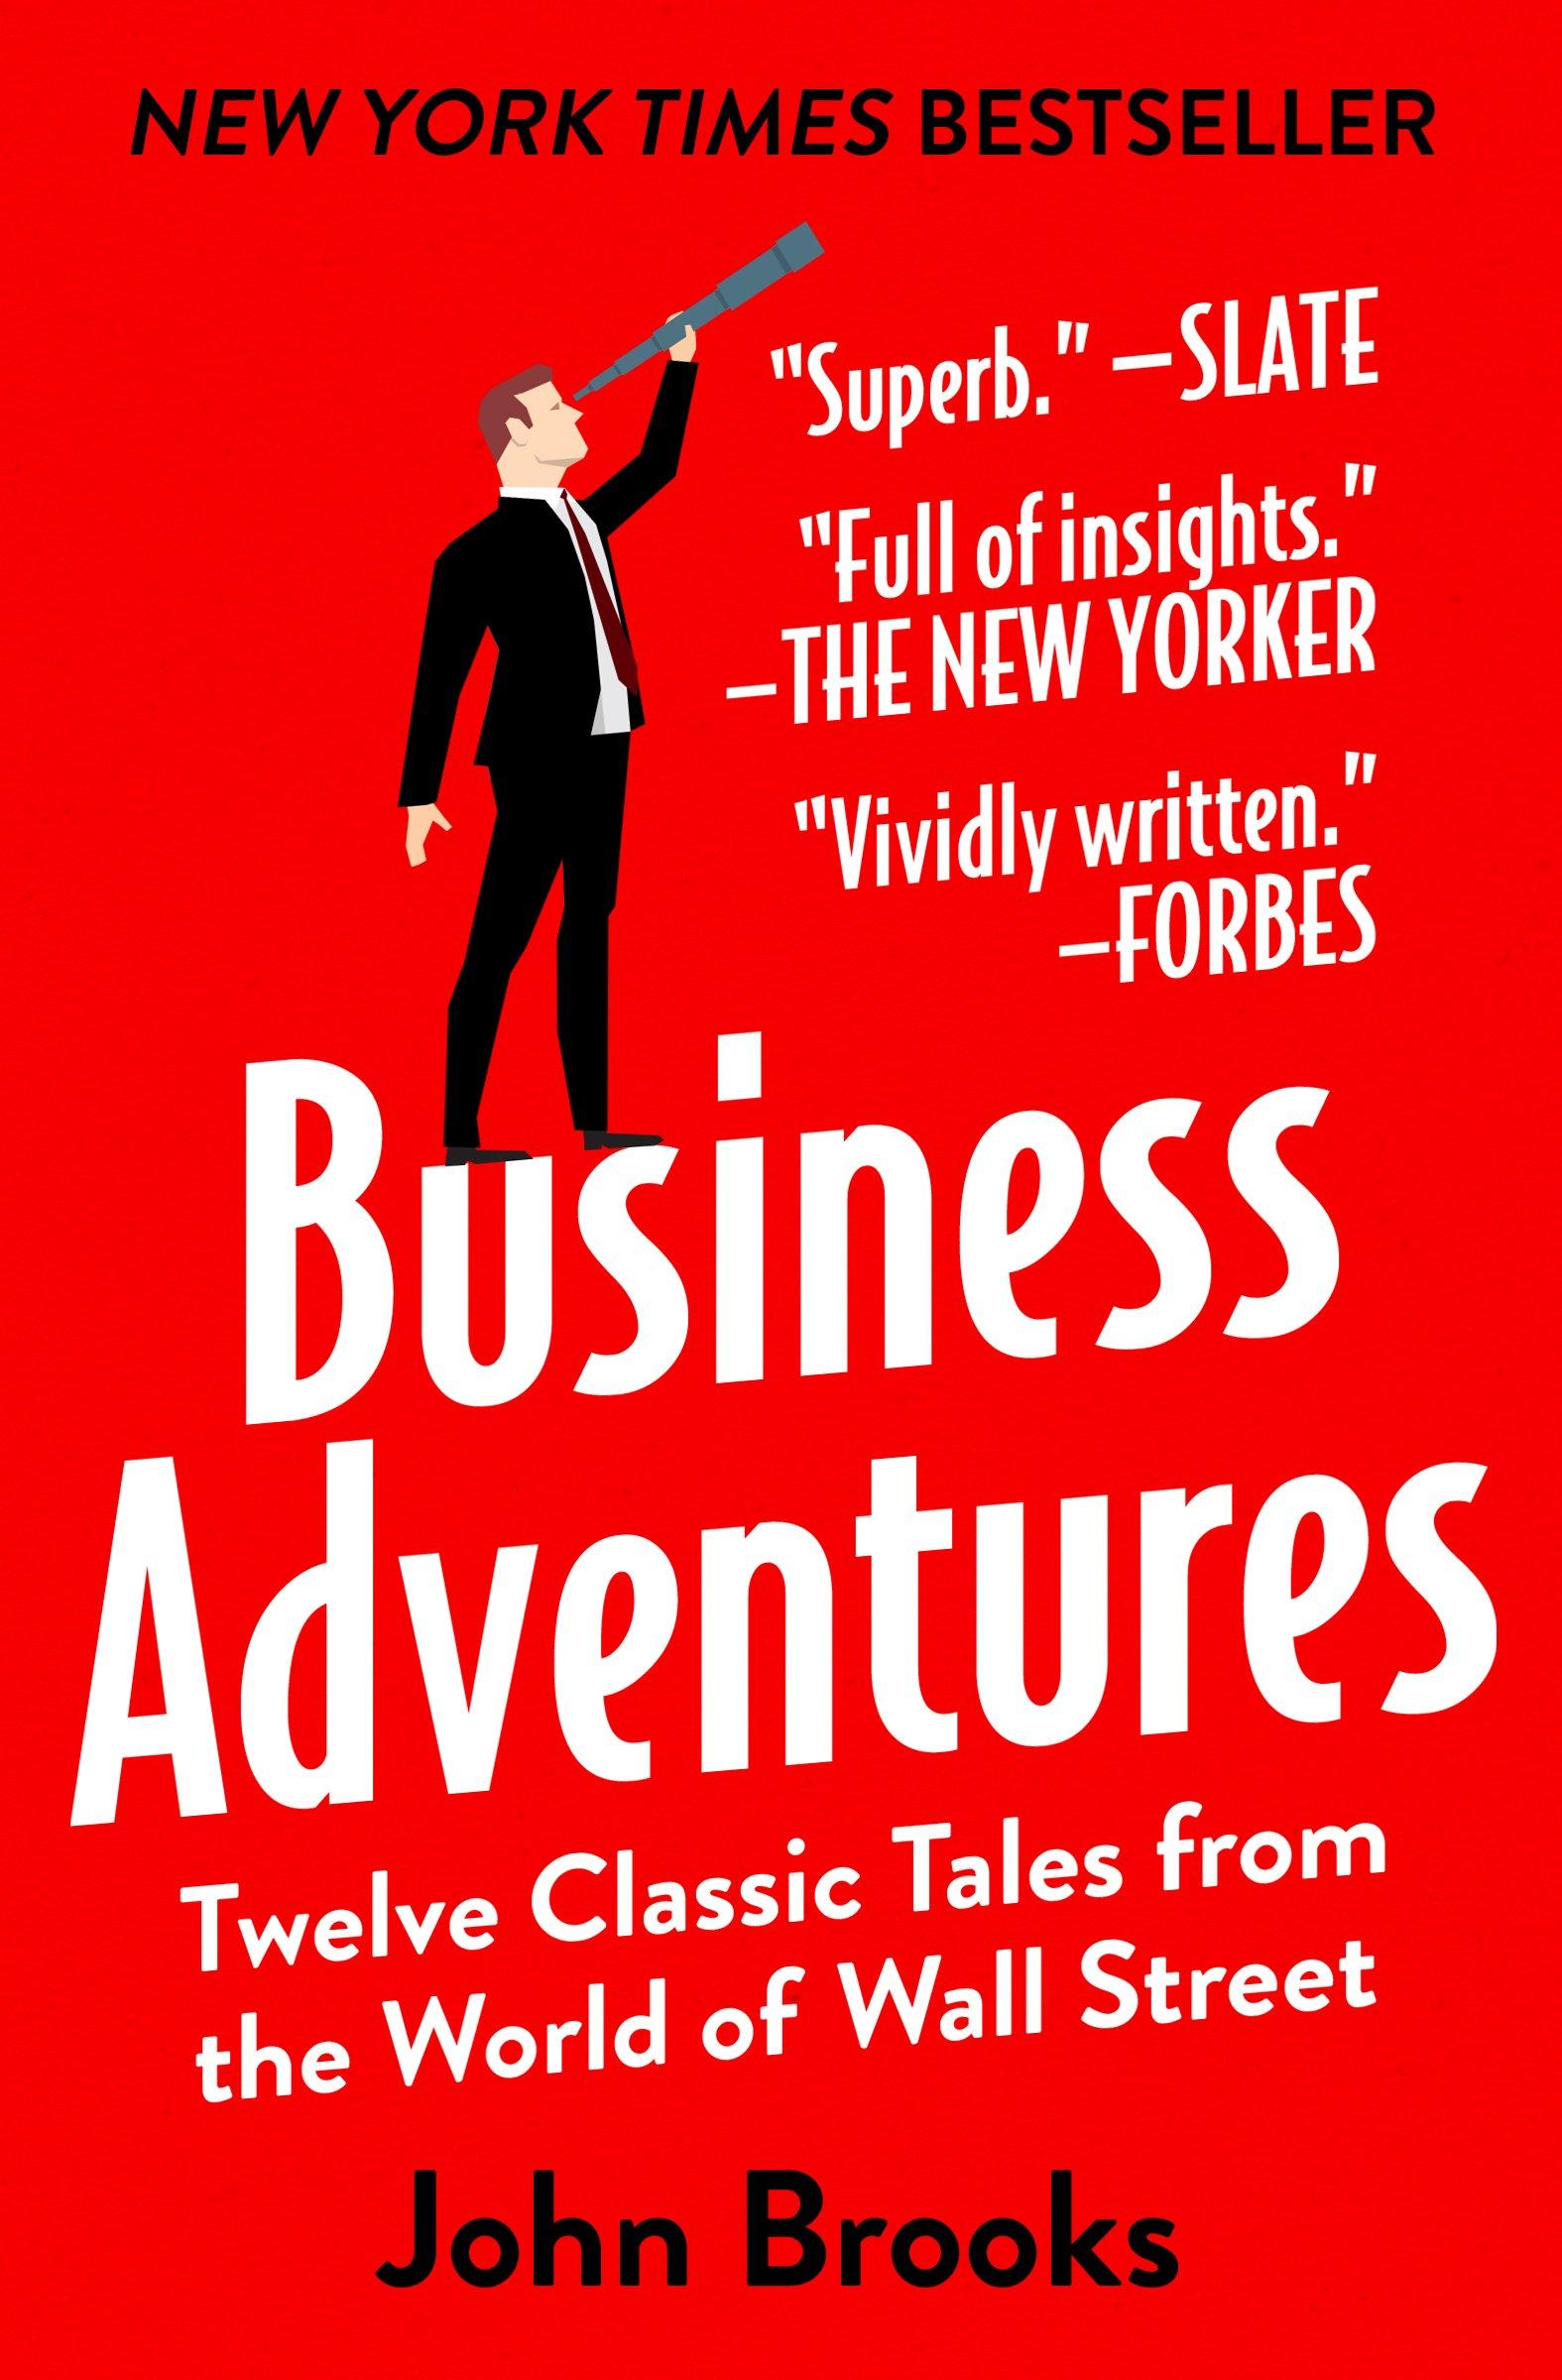 John Brooks - Business Adventures